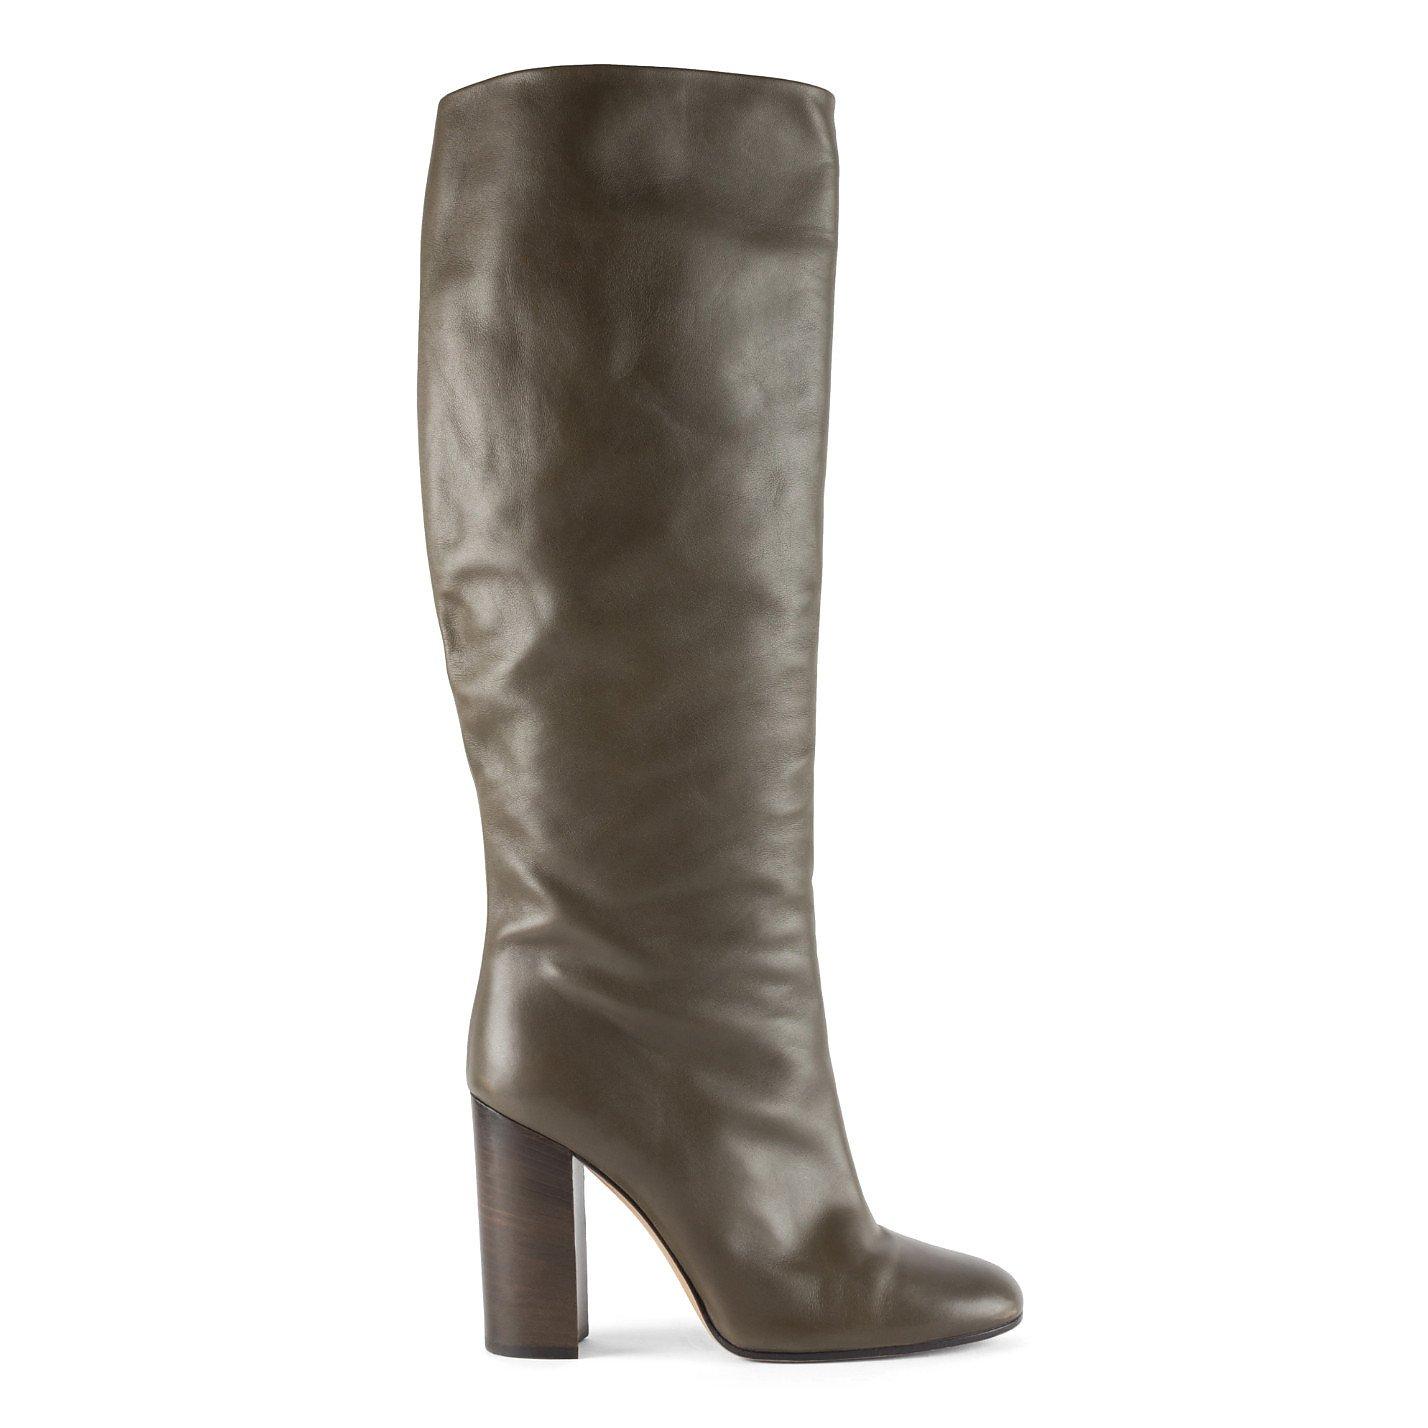 Bally Knee-High Heeled Boots